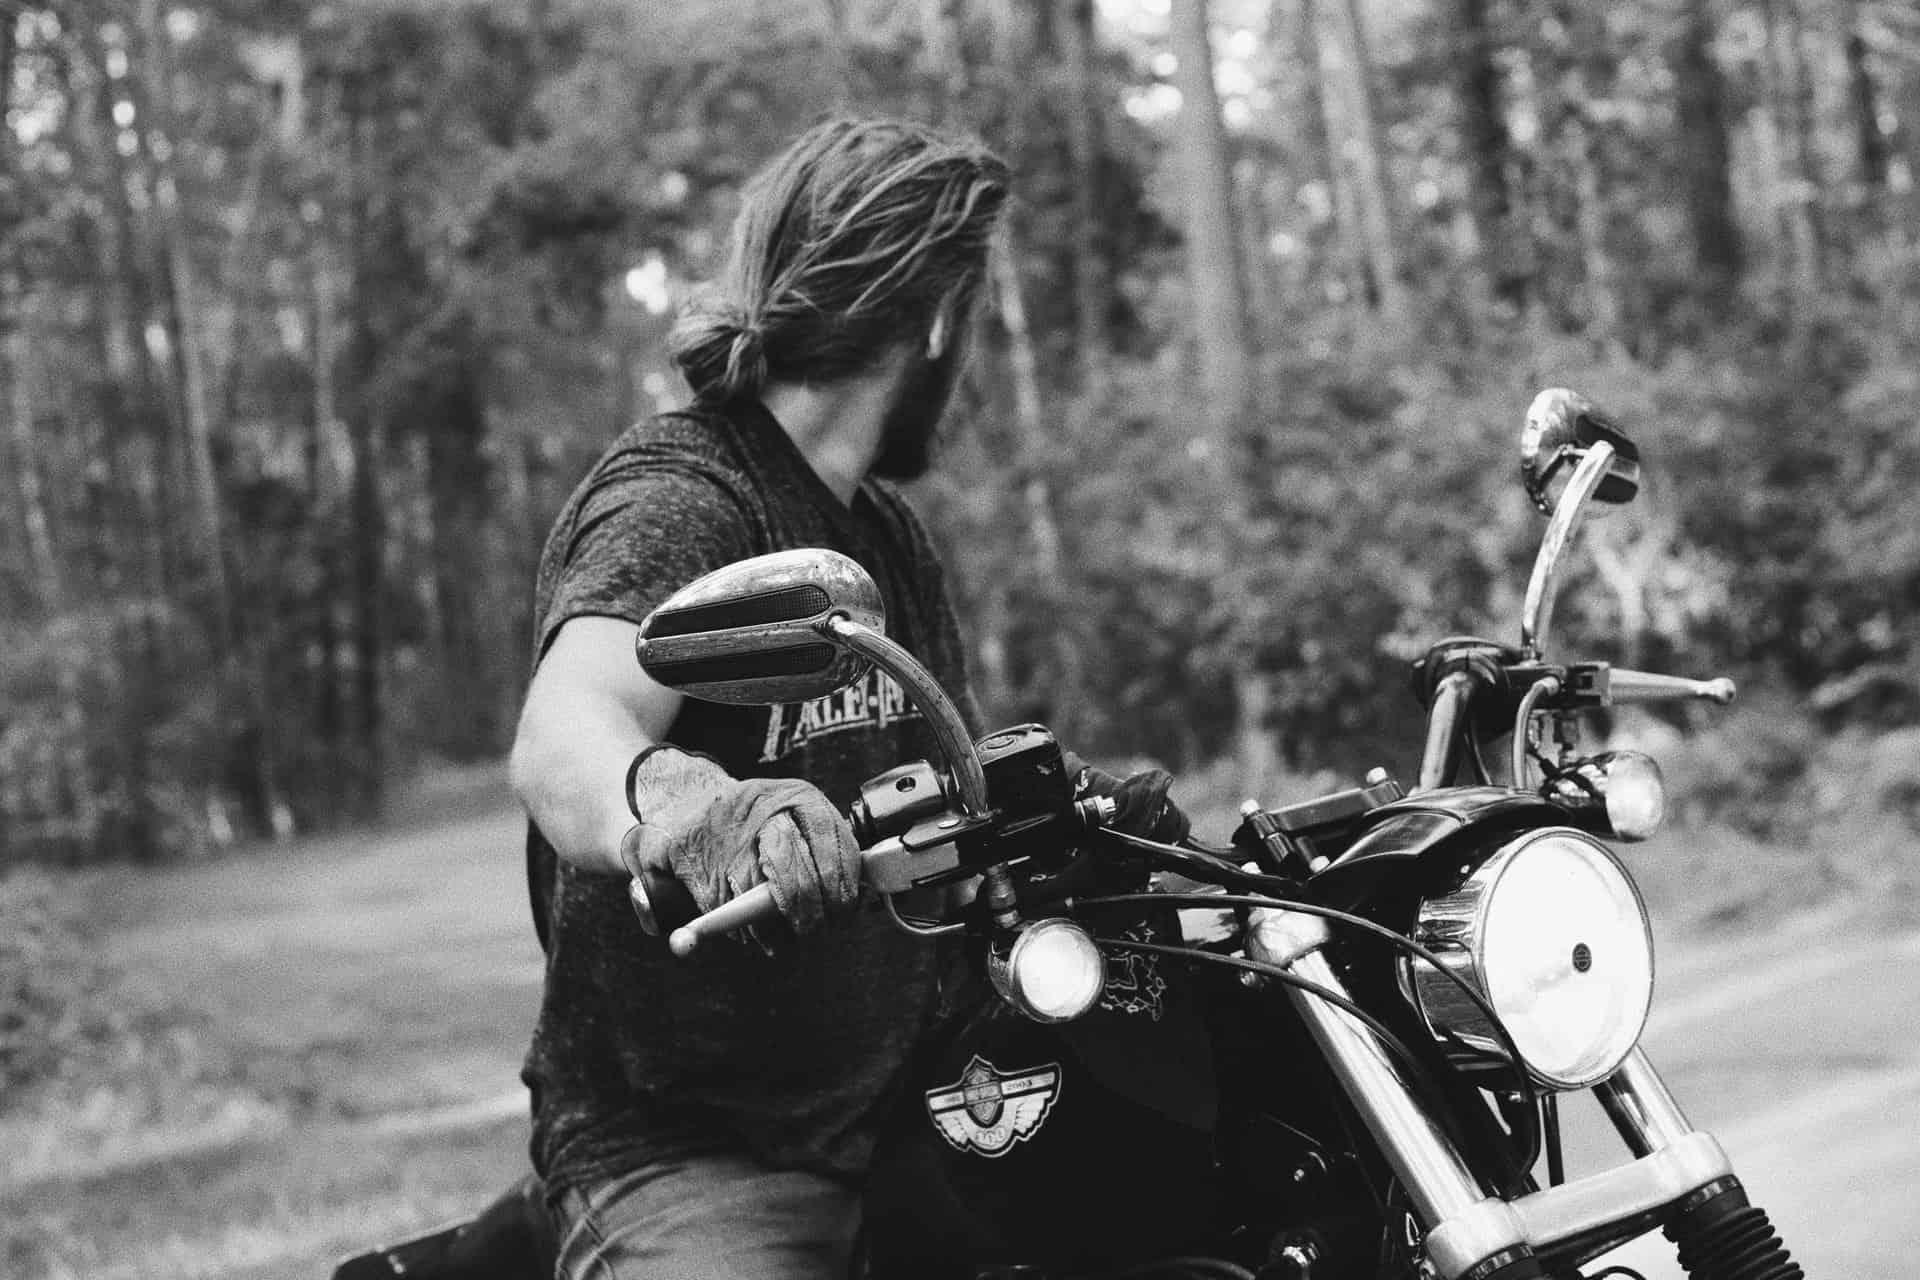 monochrome man motorcycle